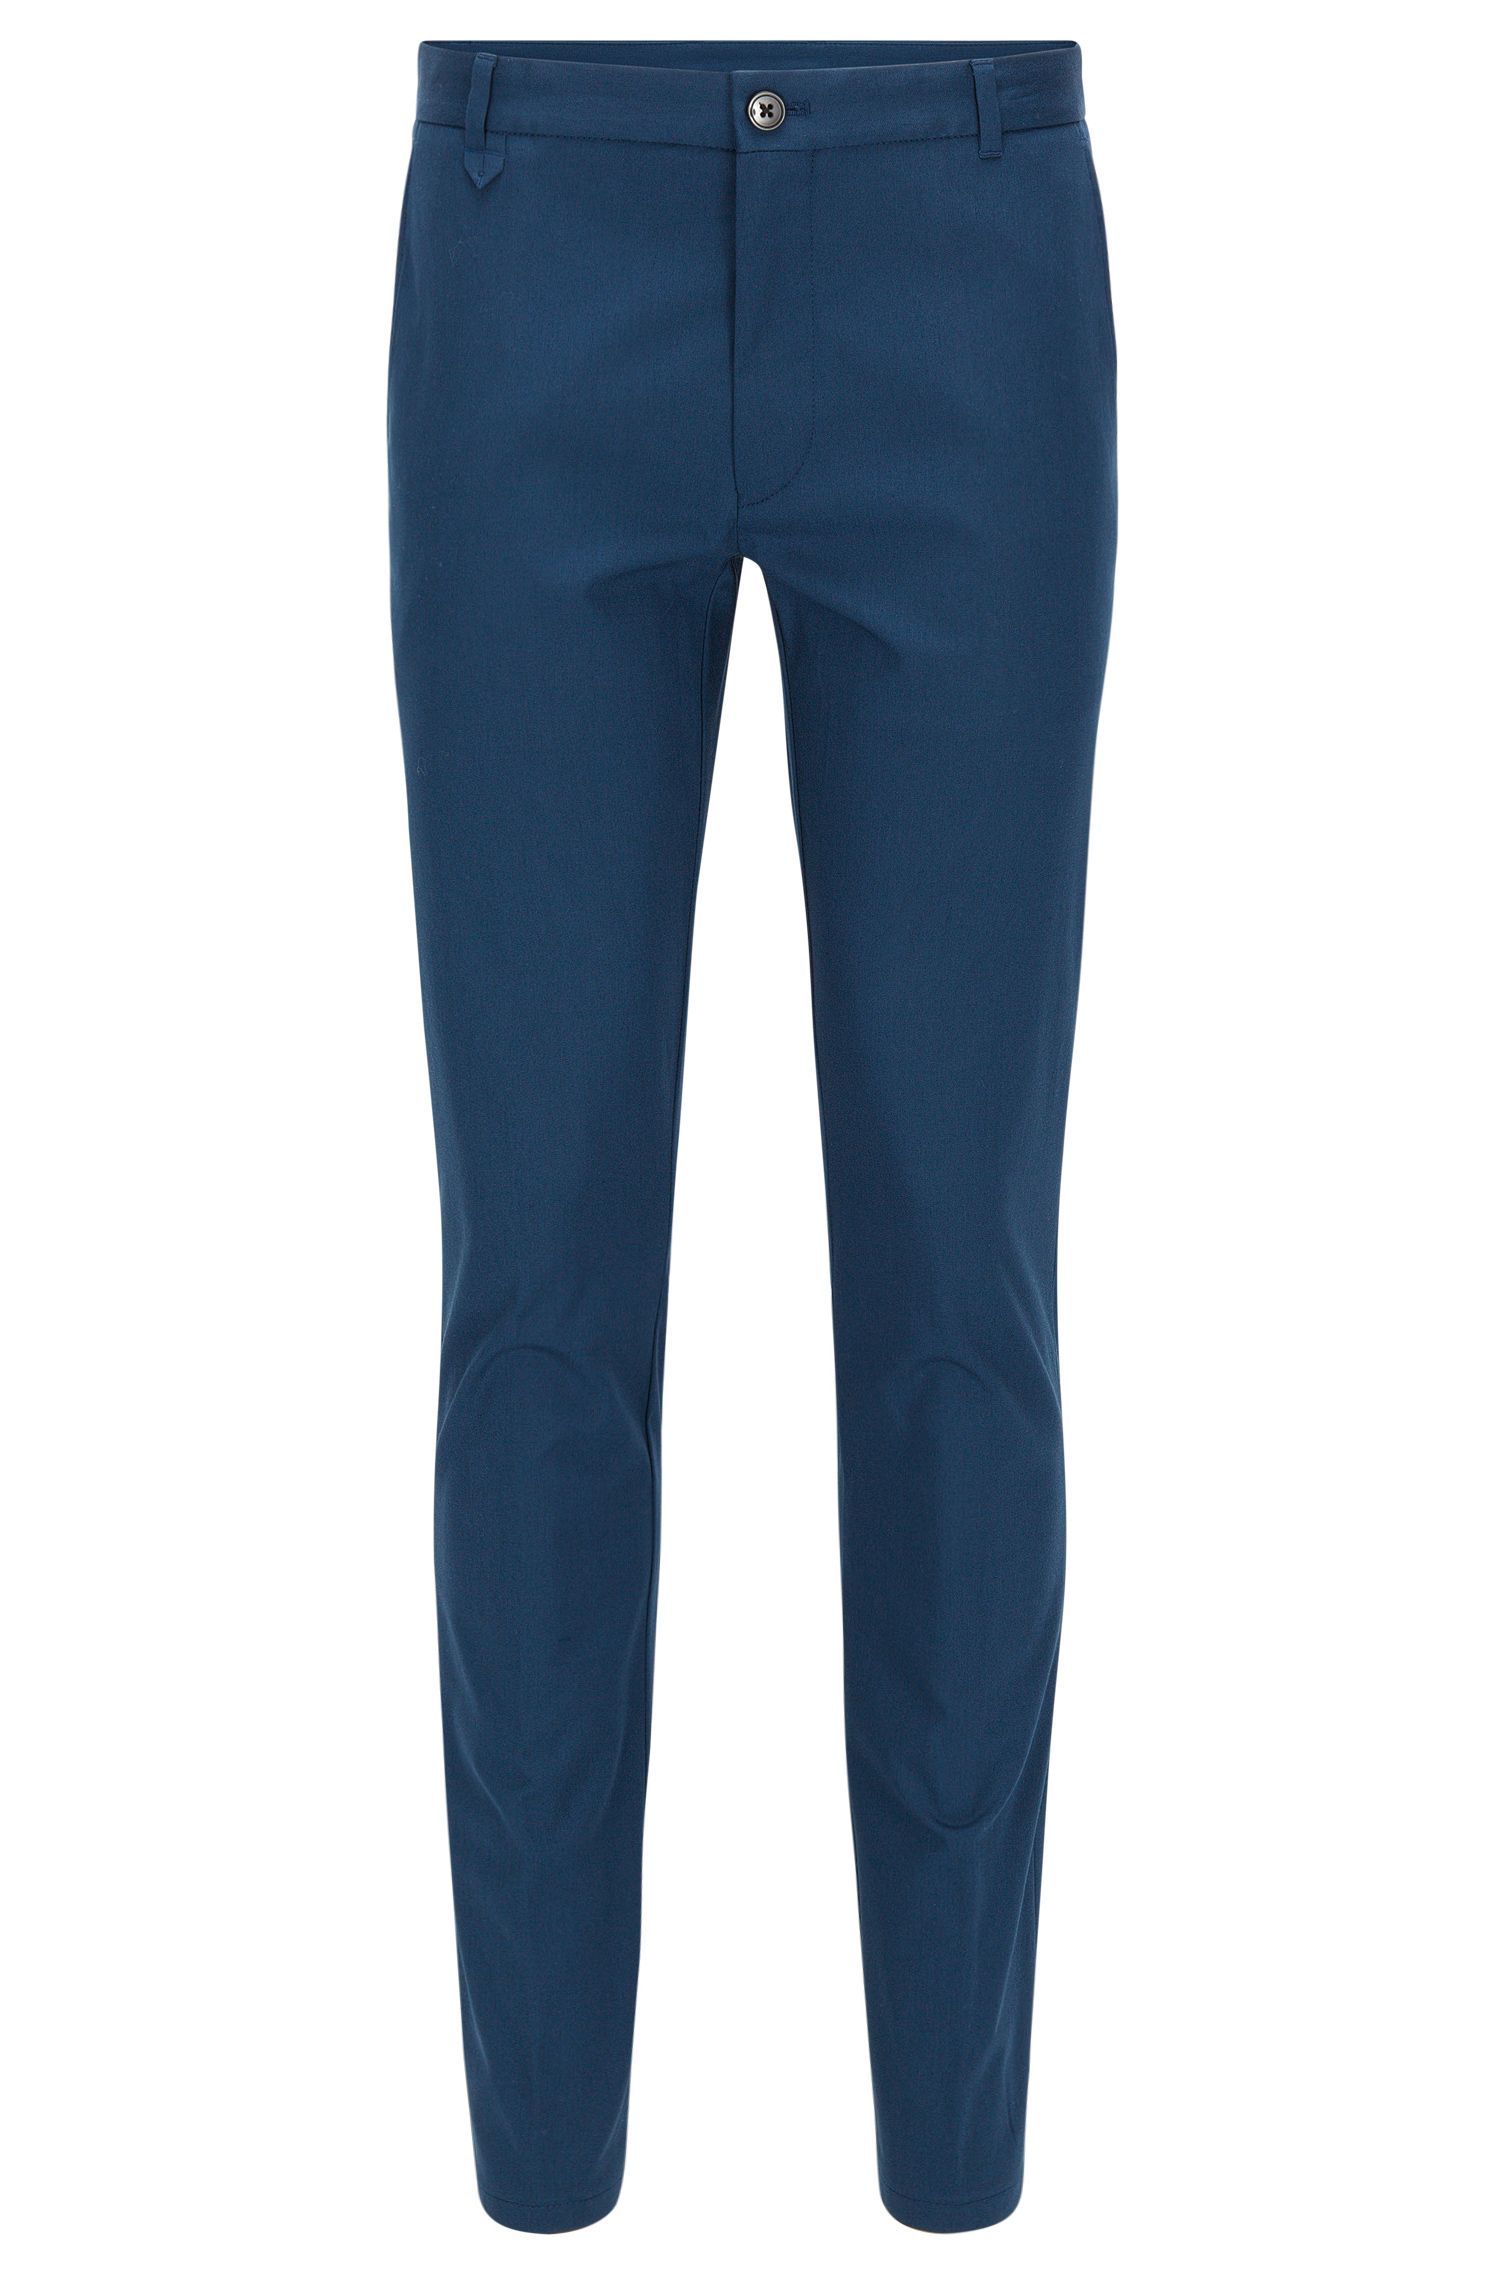 Pantalón extra slim fit en algodón elástico